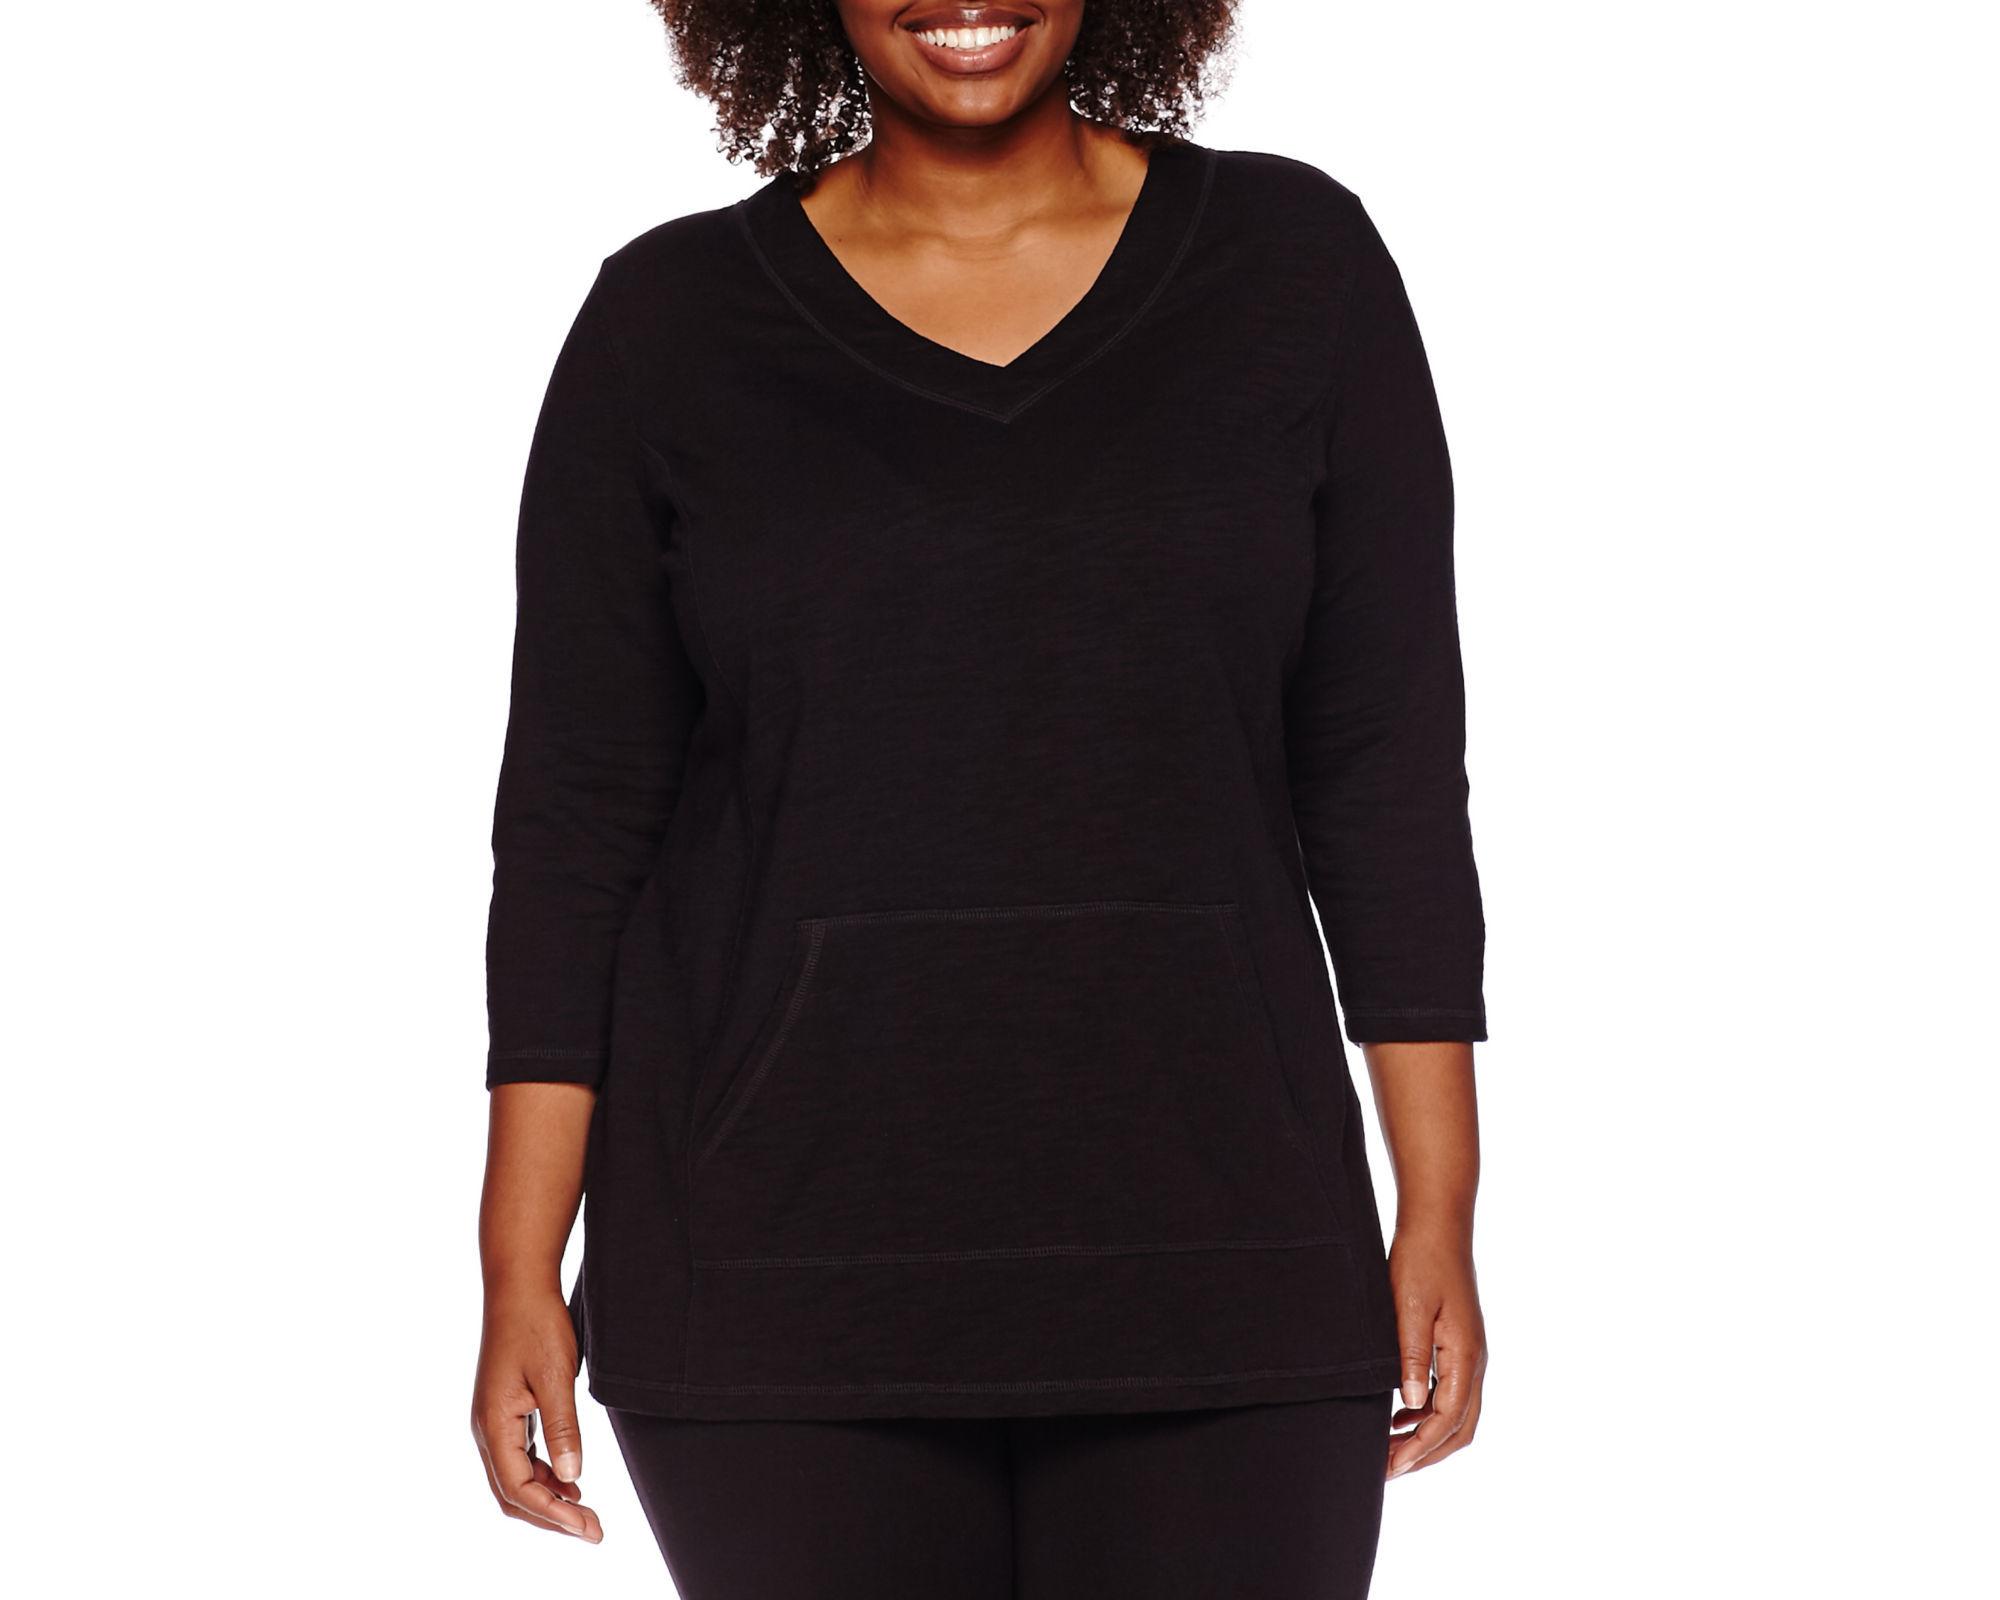 Liz Claiborne 3/4-Sleeve V-Neck Pullover Tunic - Plus